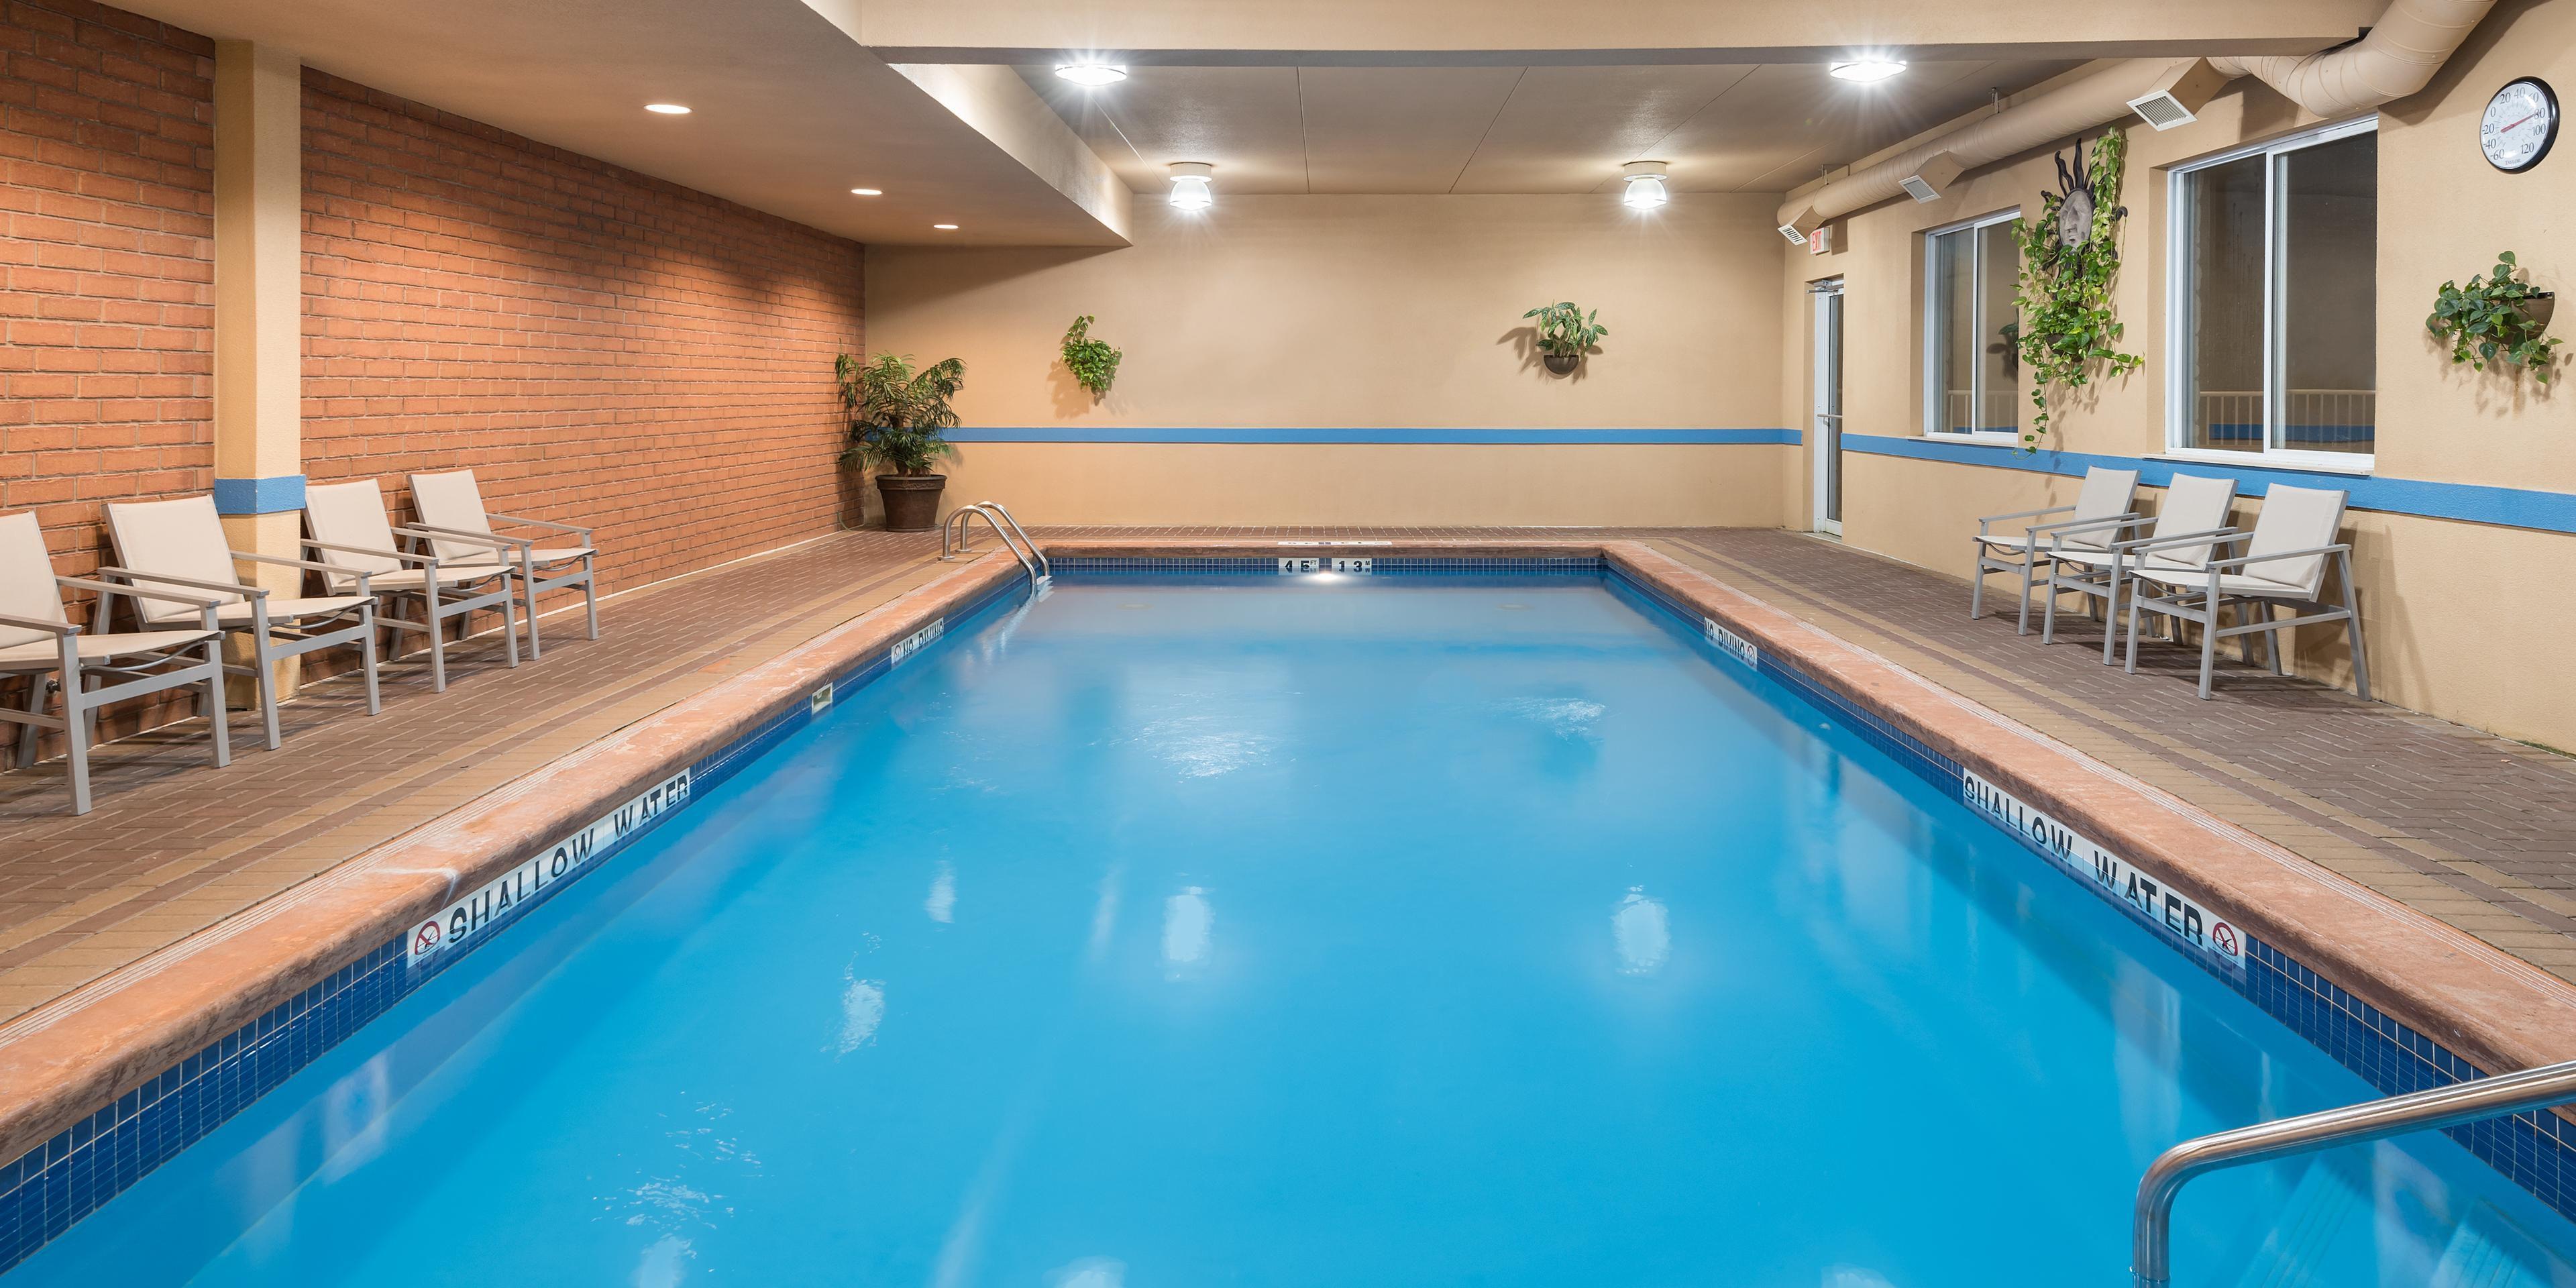 Holiday Inn Express & Suites 1000 Islands - Gananoque Hotel in ...